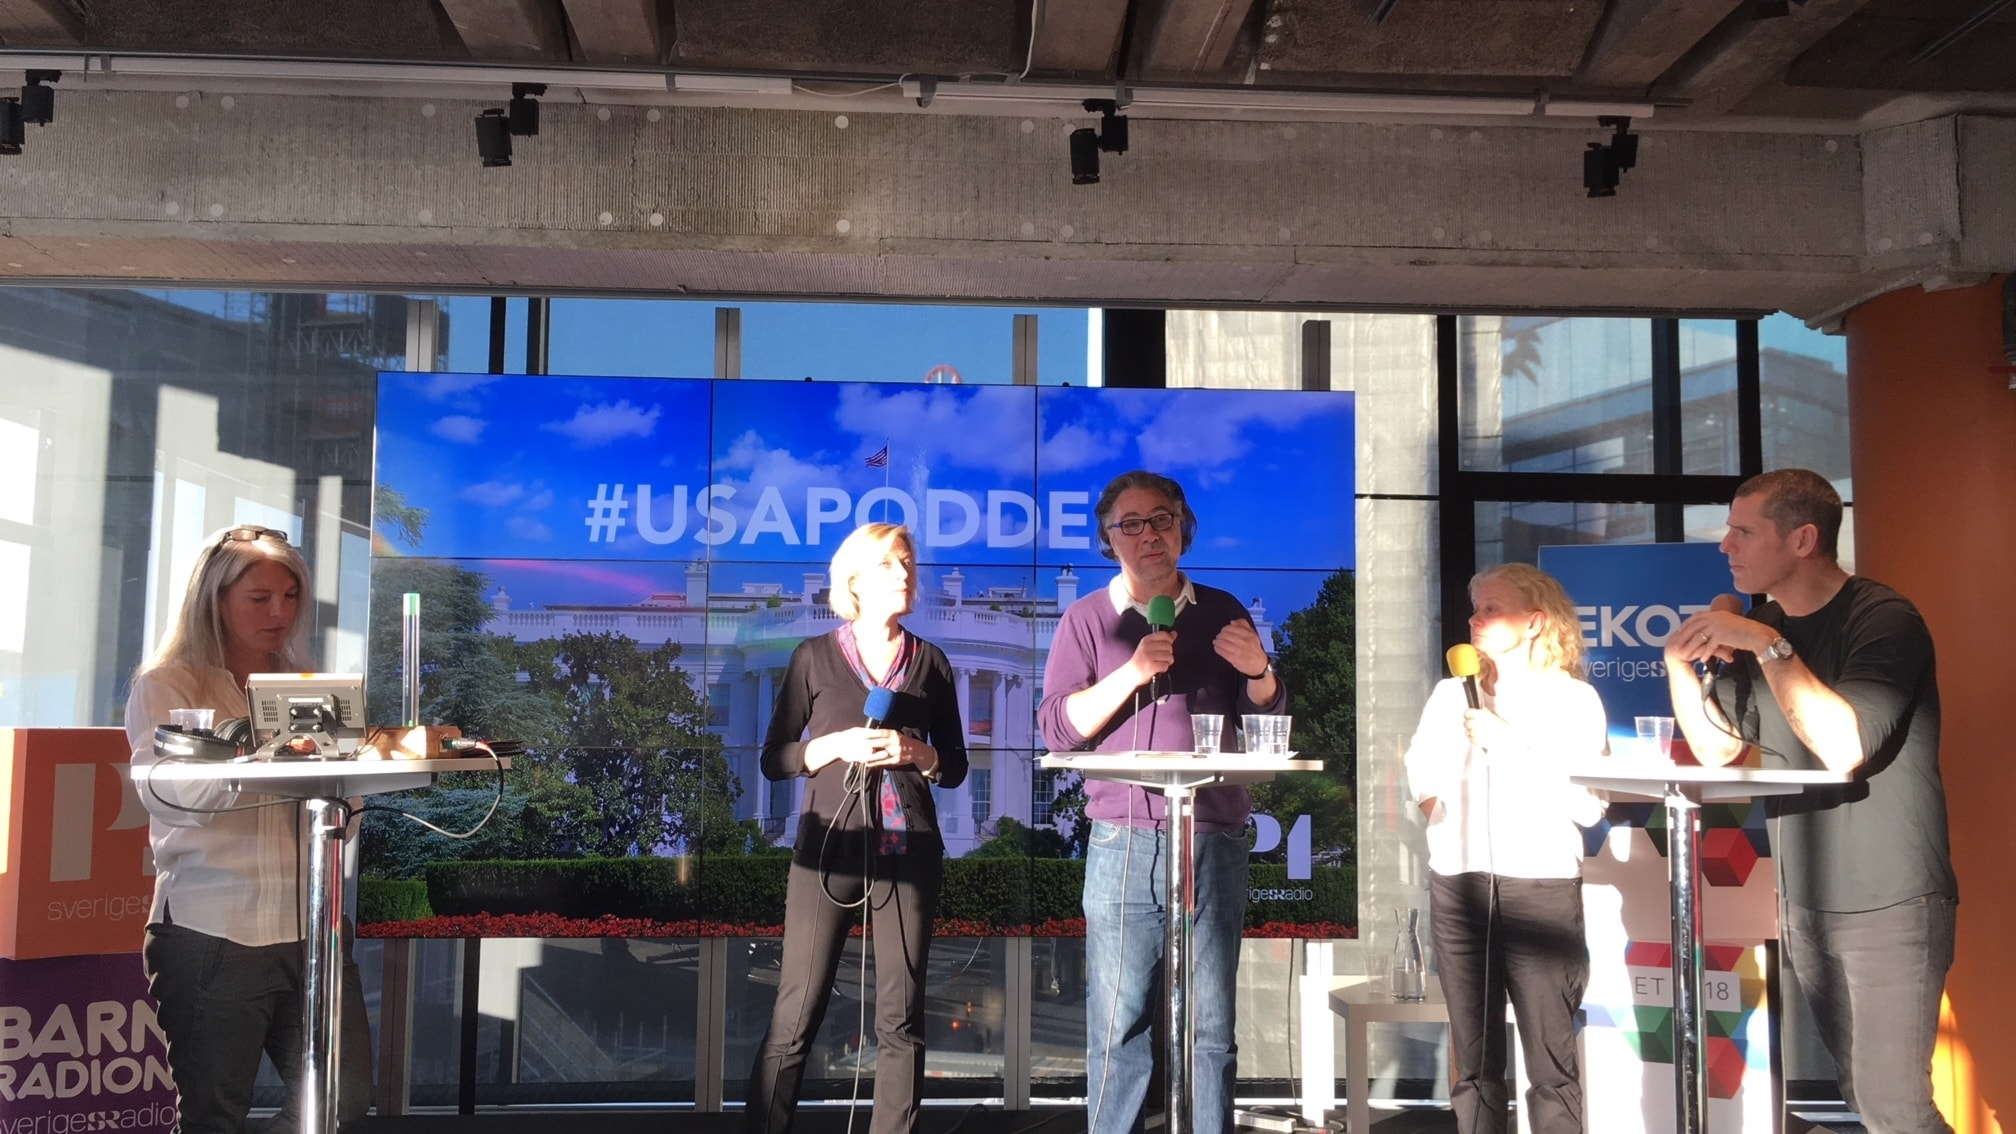 Avsnitt 131: USApodden live på Kulturhuset!